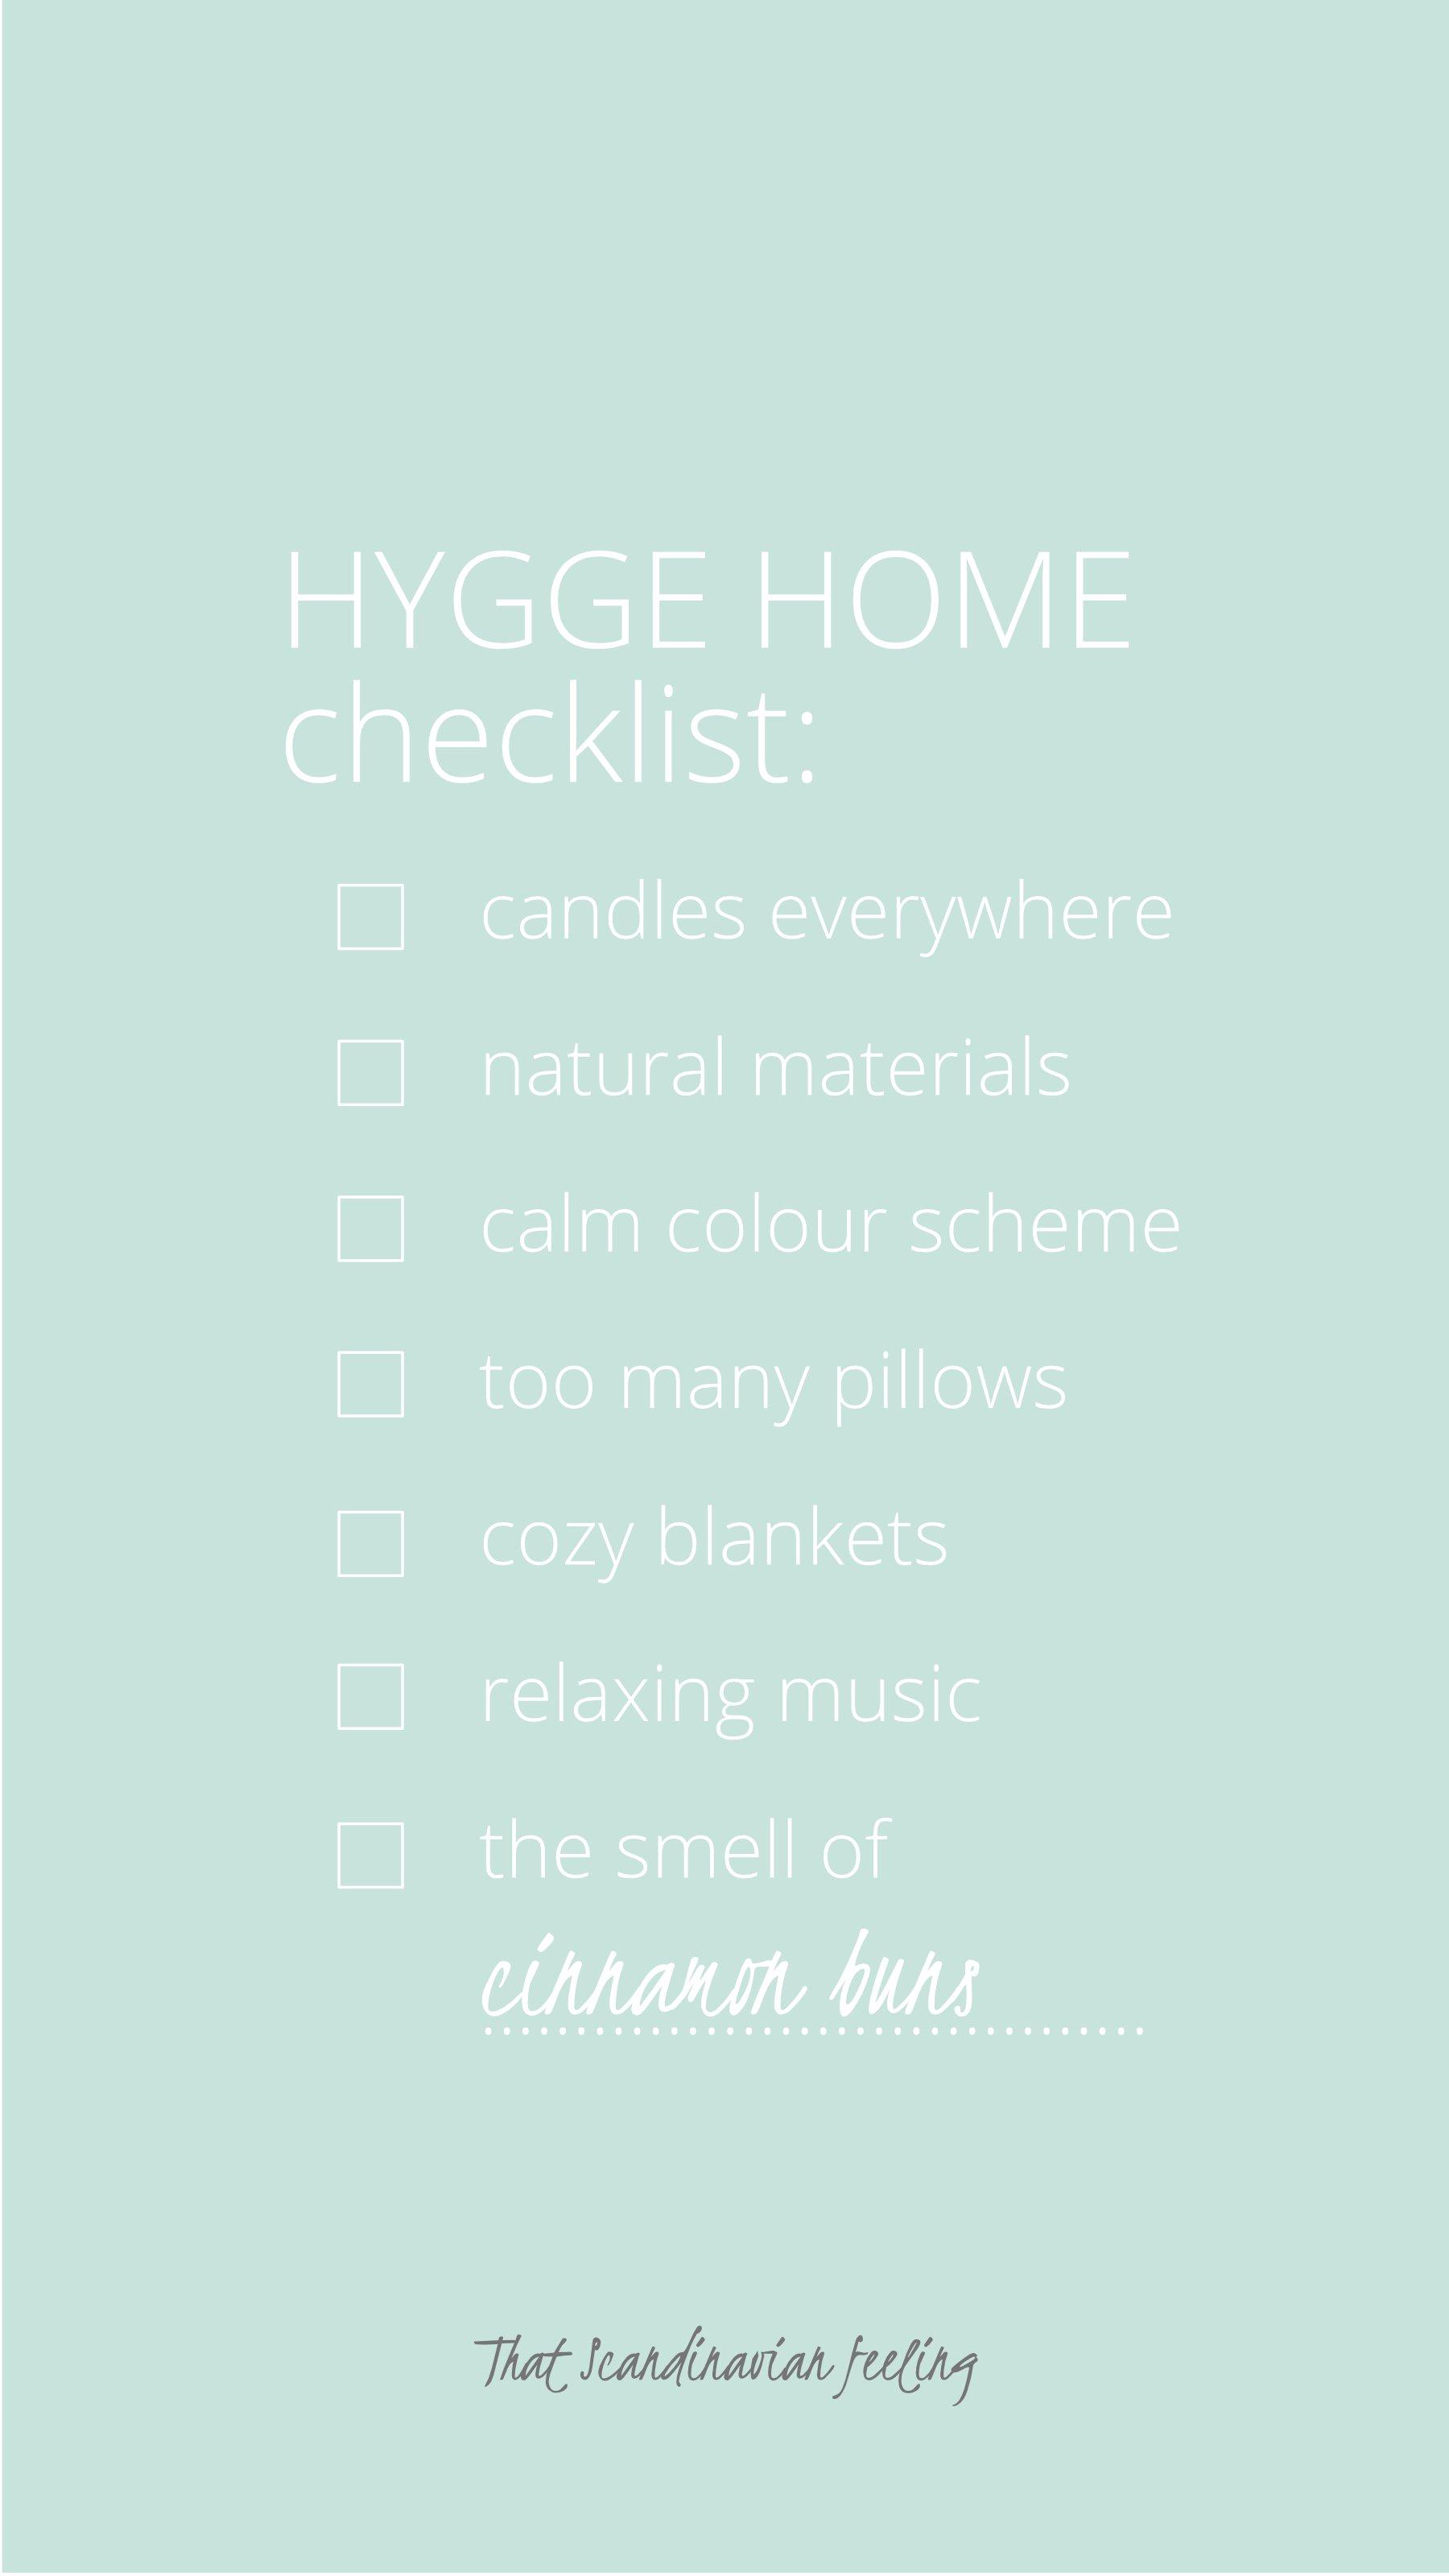 hygge checklist thatscandinavianfeeling